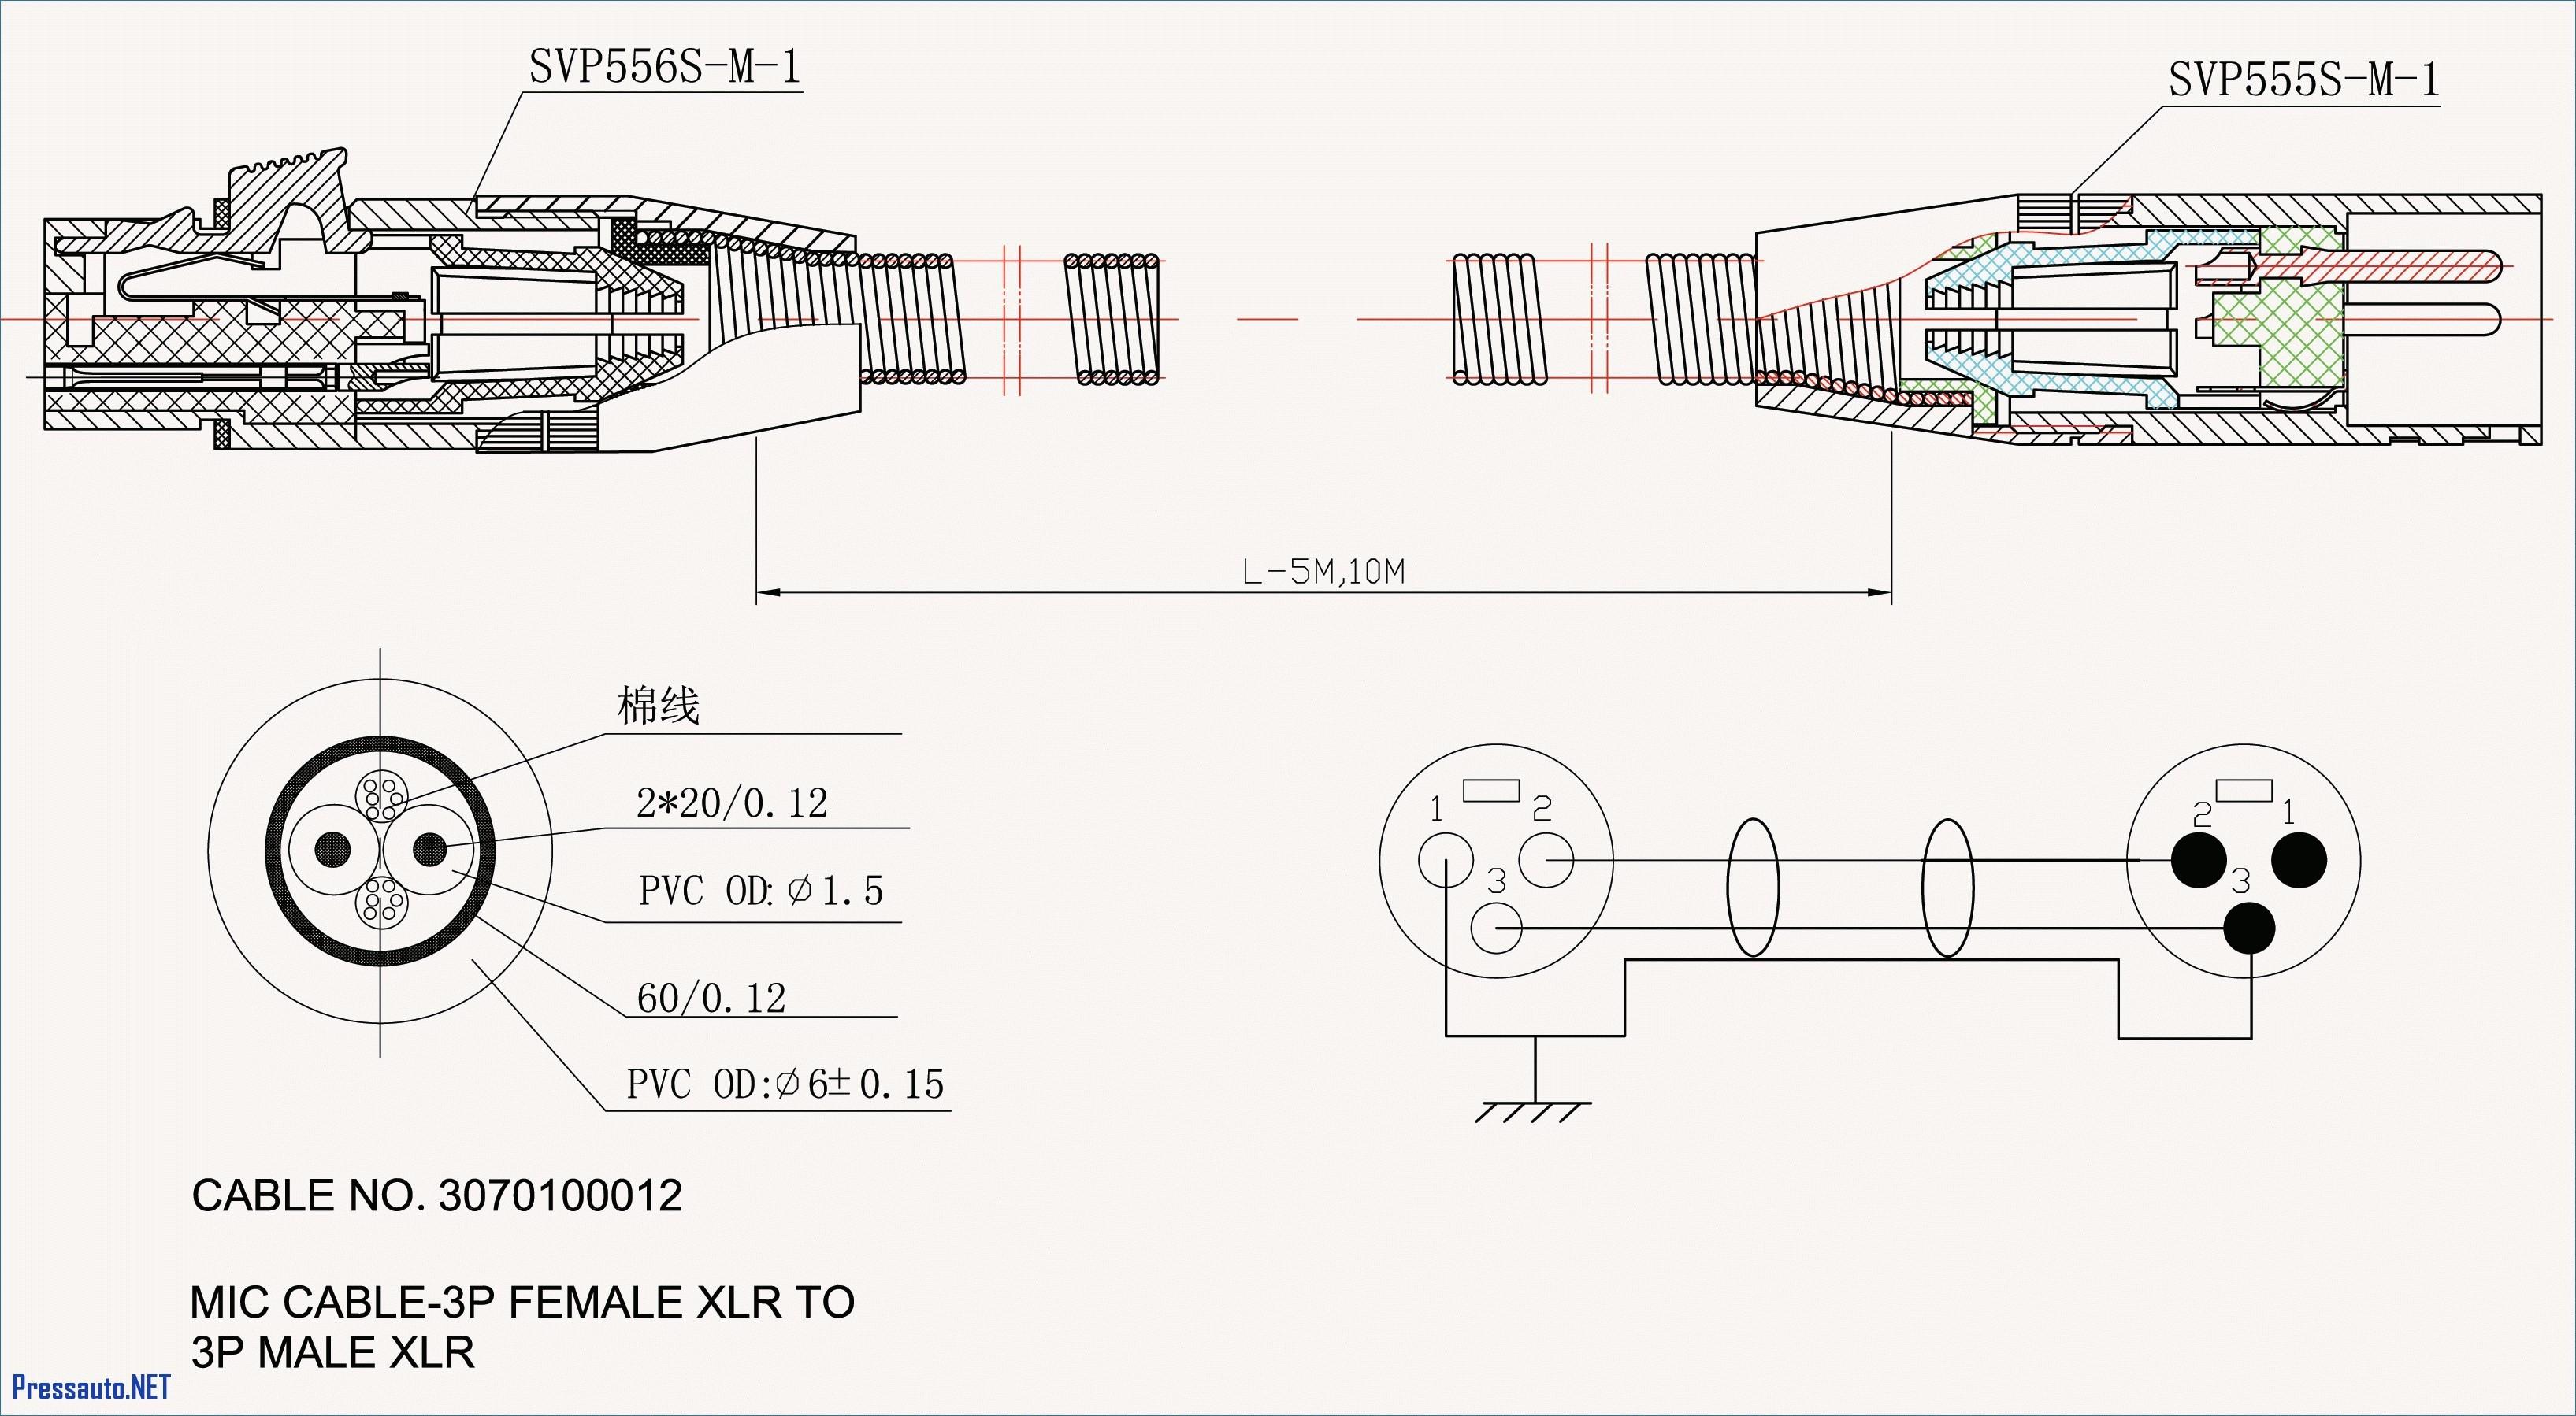 30 Amp Twist Lock Plug Wiring Diagram 50 Amp Twist Lock Plug ...  Amp Twist Lock Wiring Diagram on